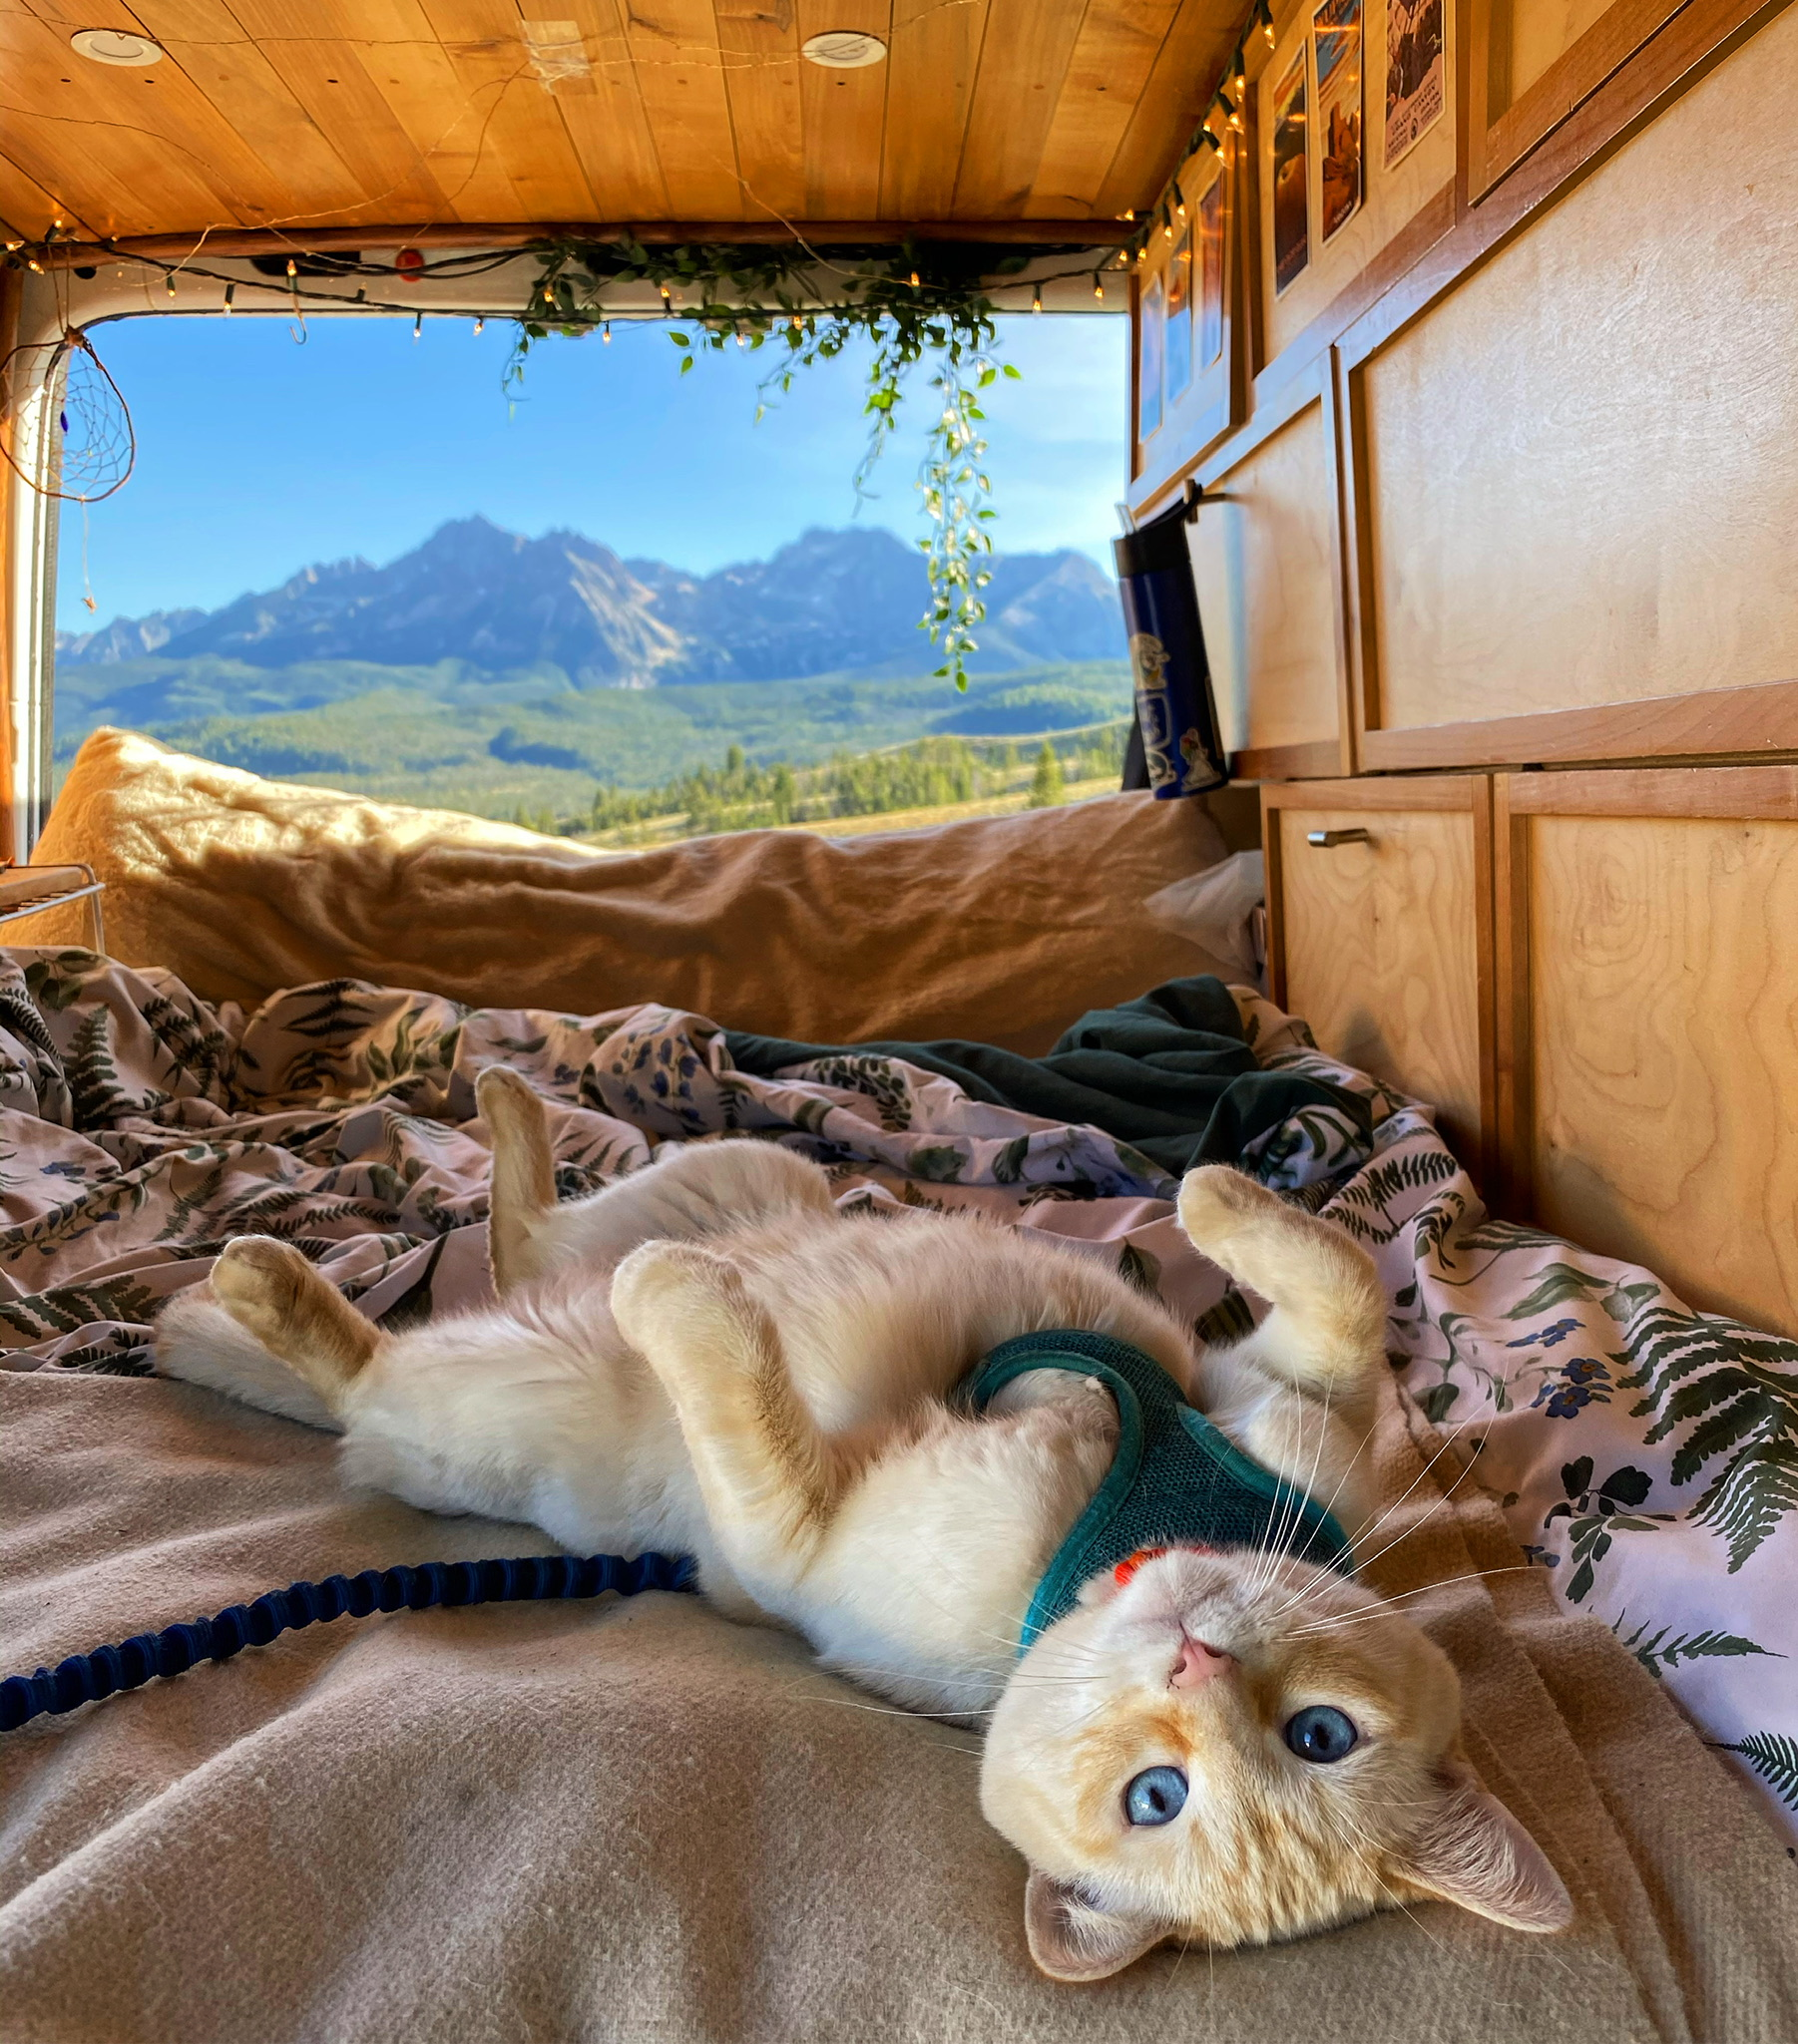 vanlife with a cat - samvanzam